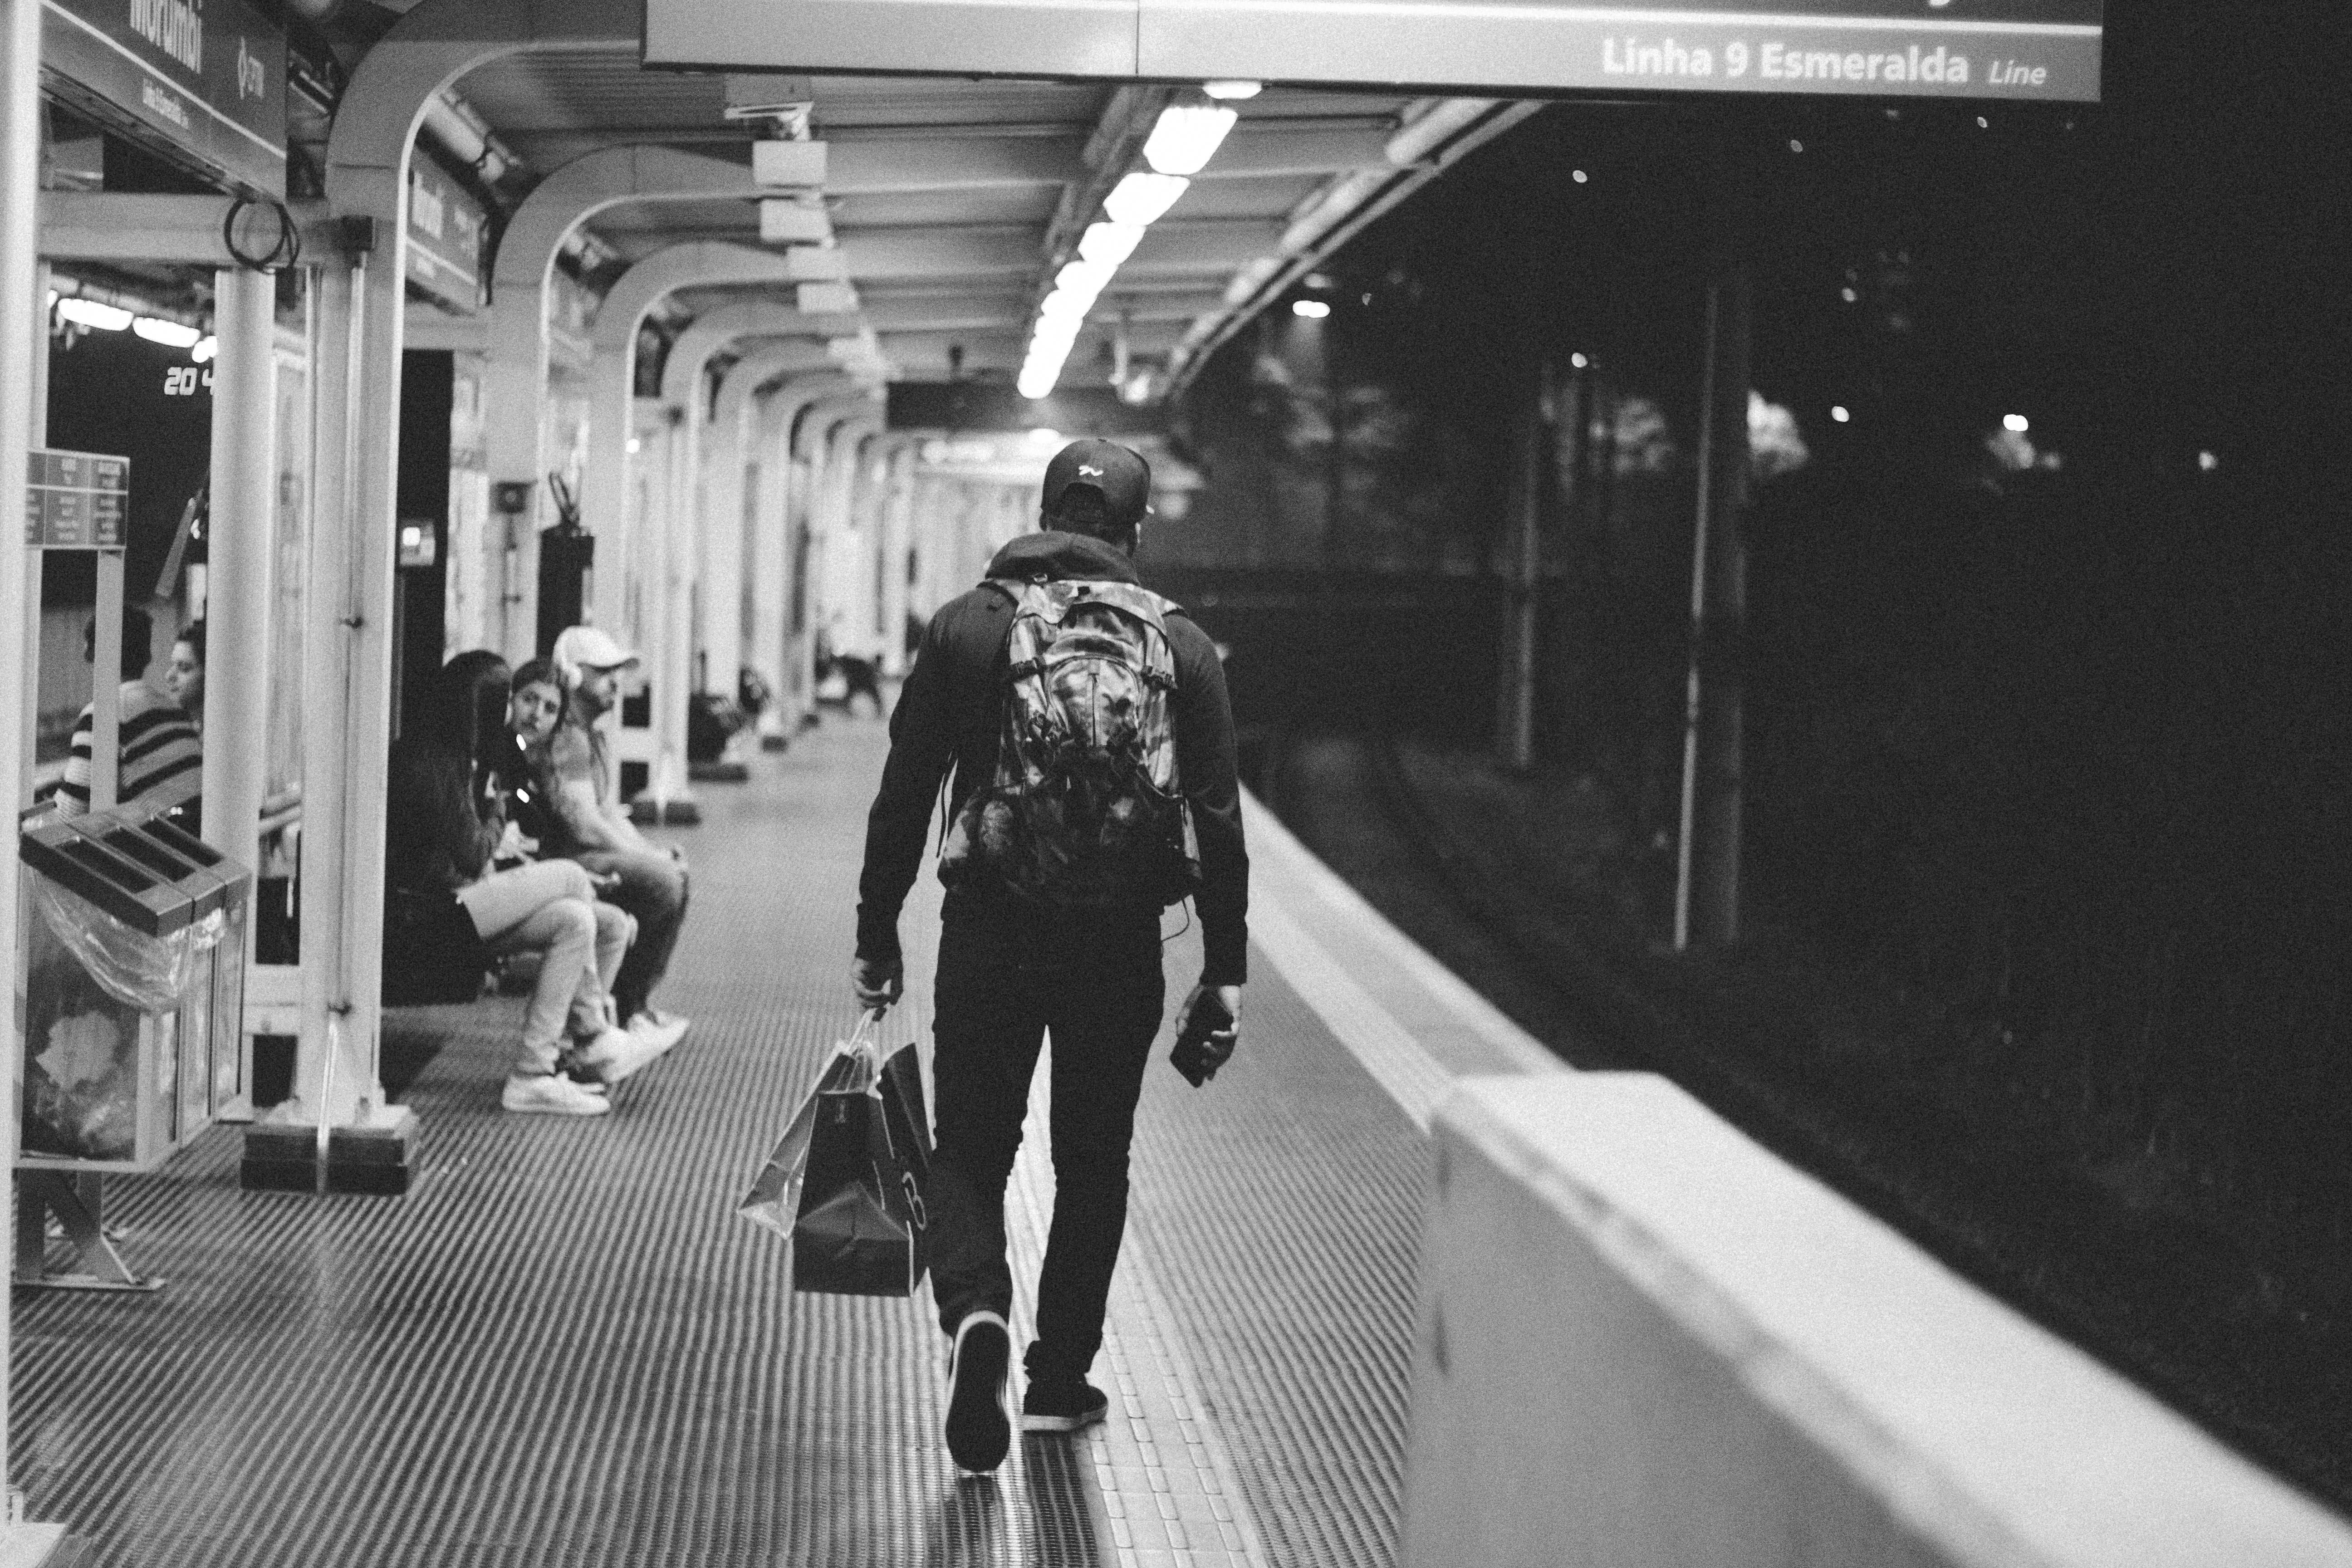 Train Station, Train, Walk, Walking, Subway, HQ Photo